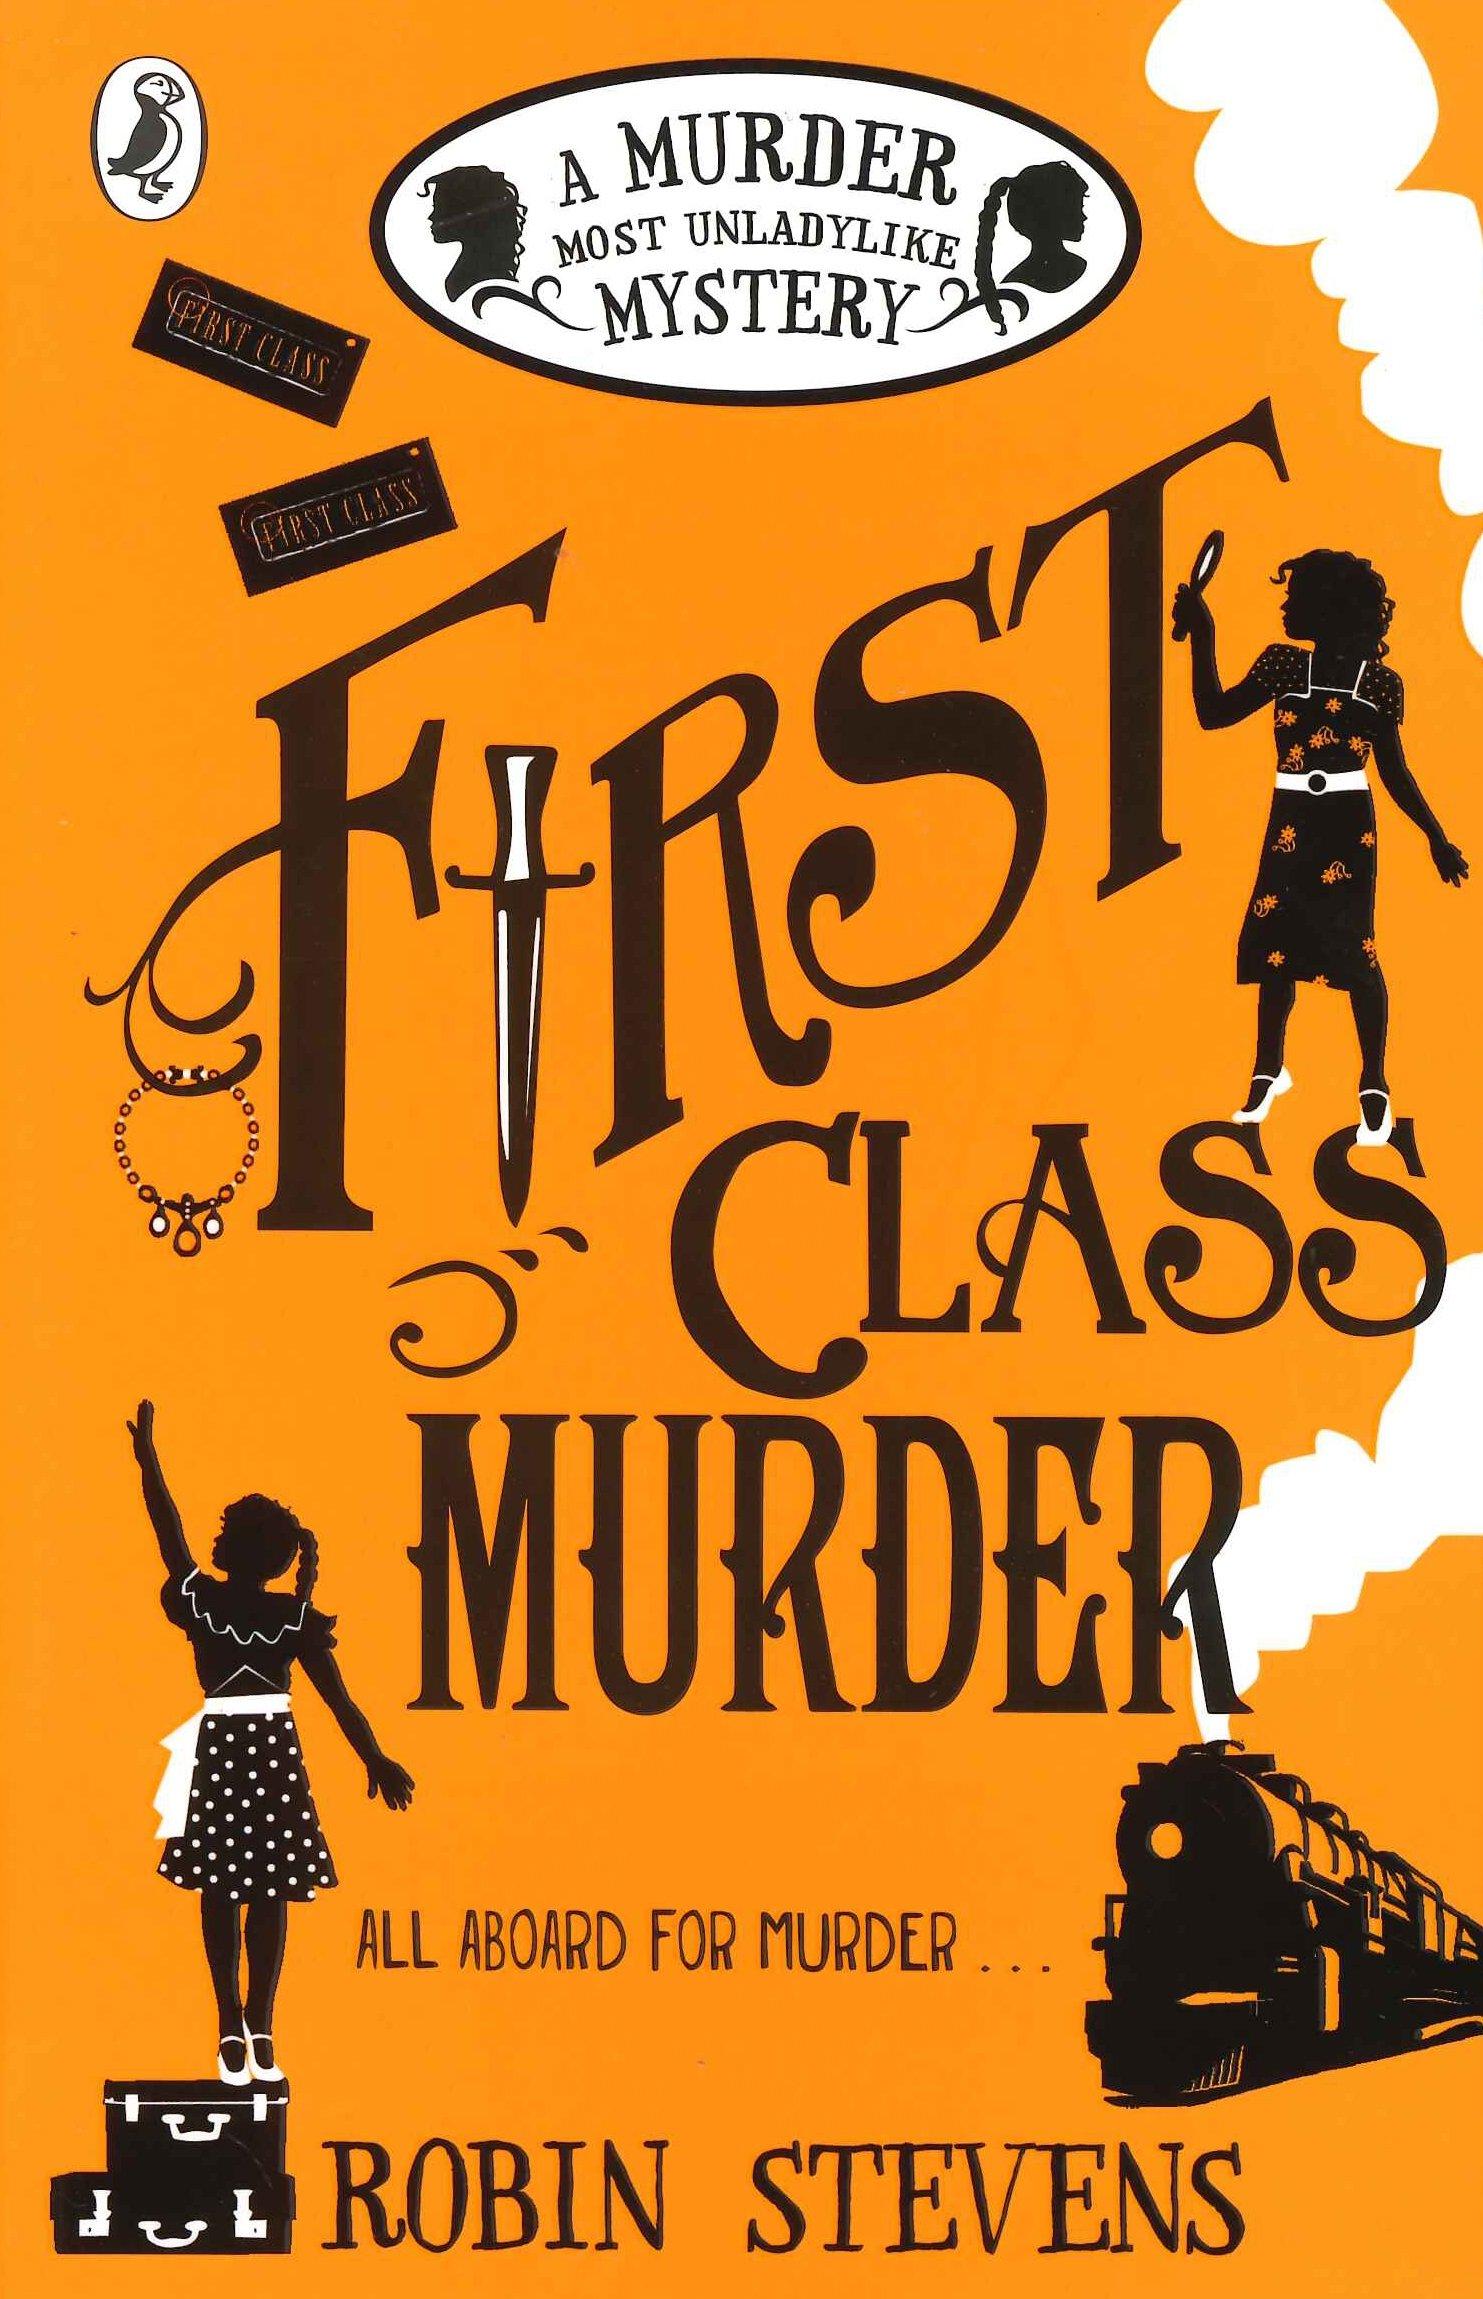 First Class Murder  A Murder Most Unladylike Mystery